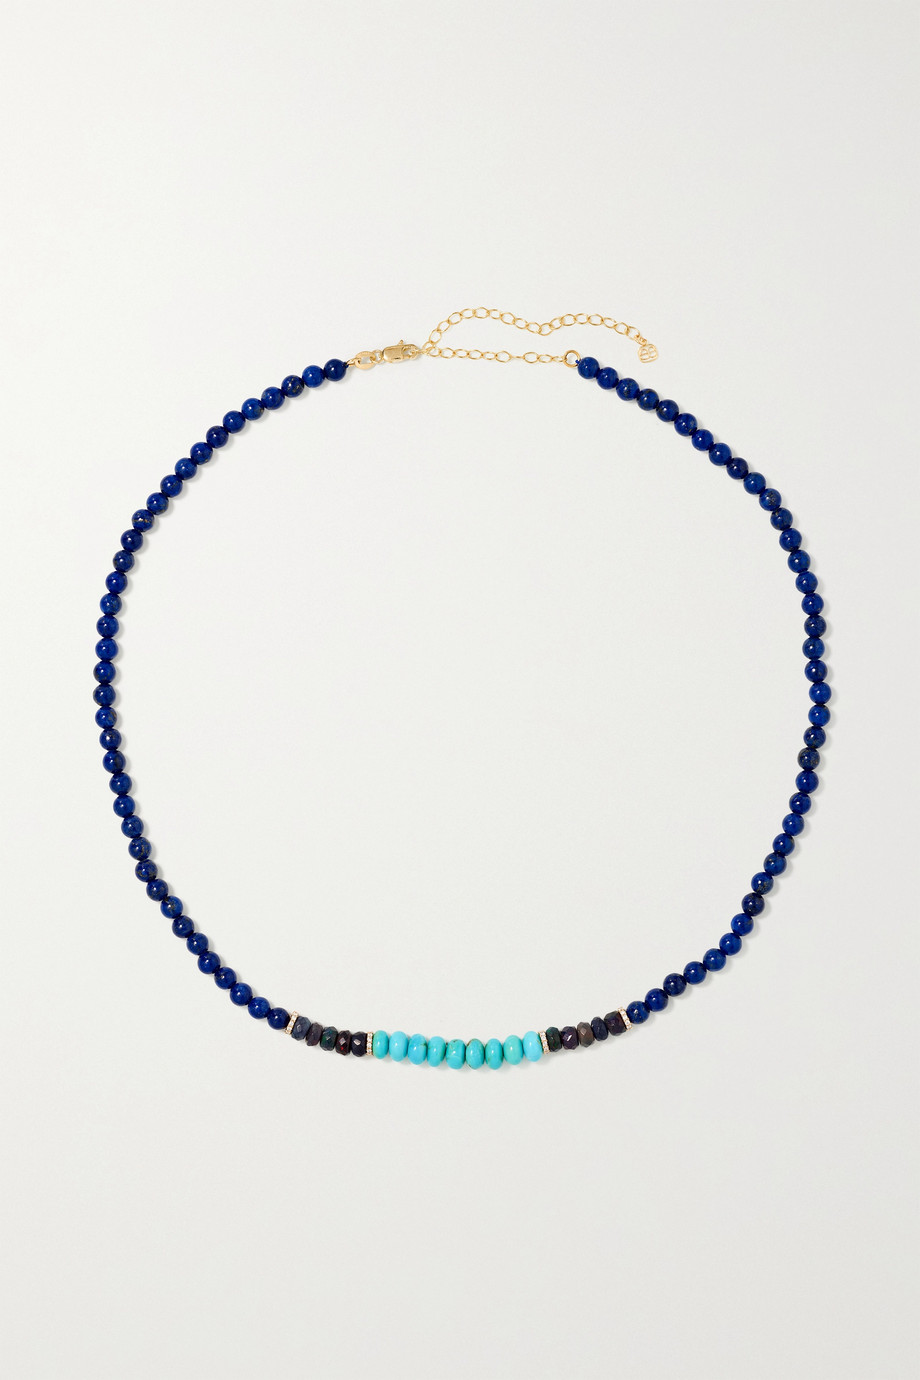 Sydney Evan 14-karat gold multi-stone necklace